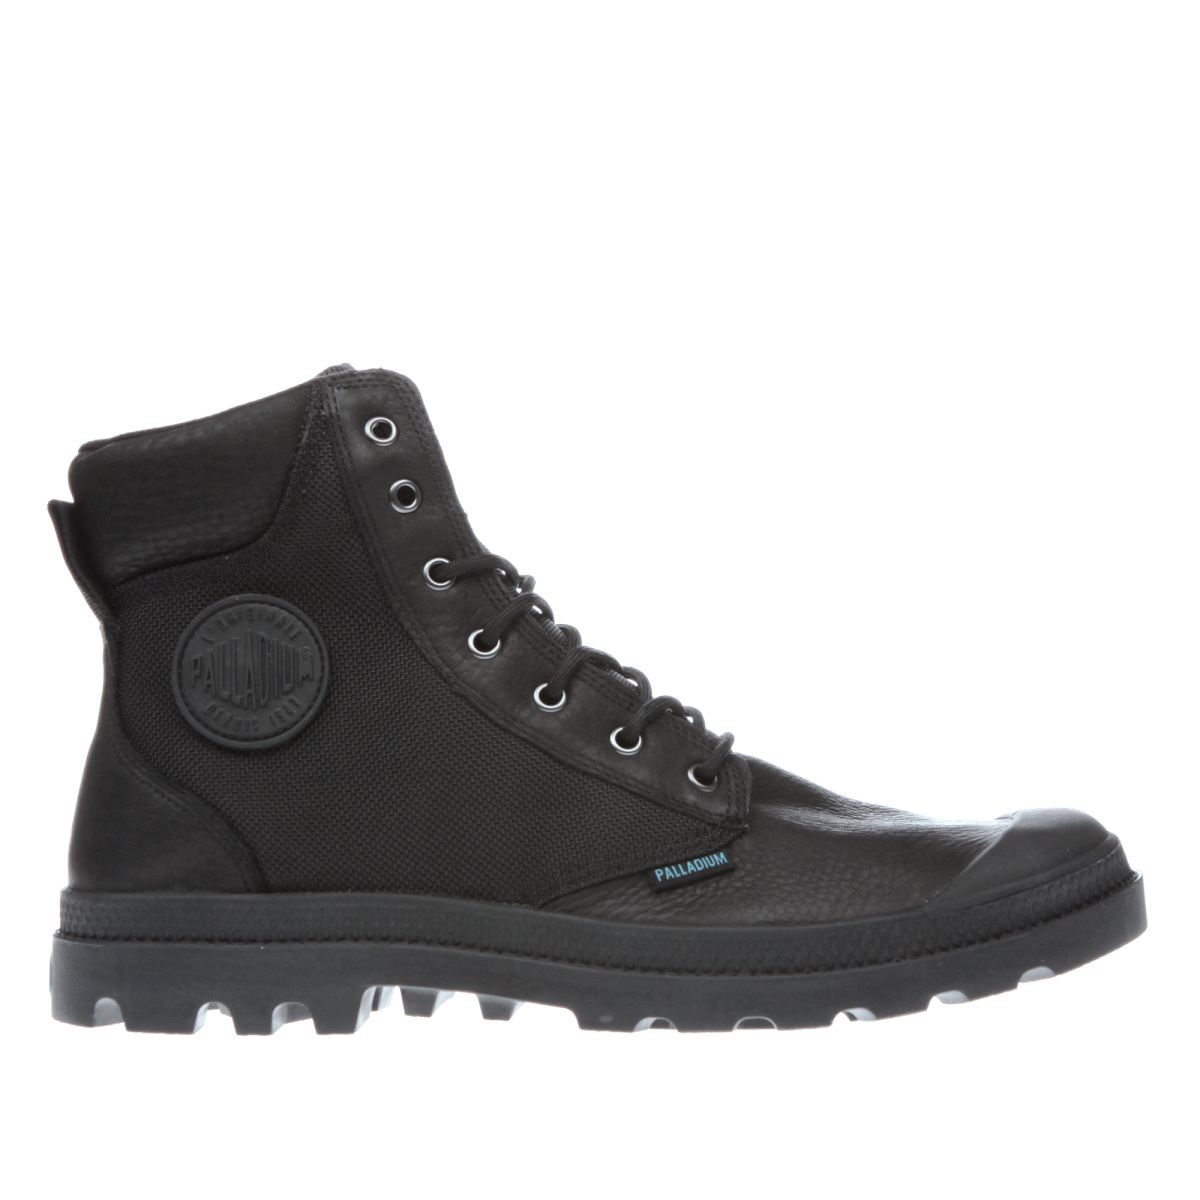 Palladium Palladium Black Pampa Sport Cuff Boots